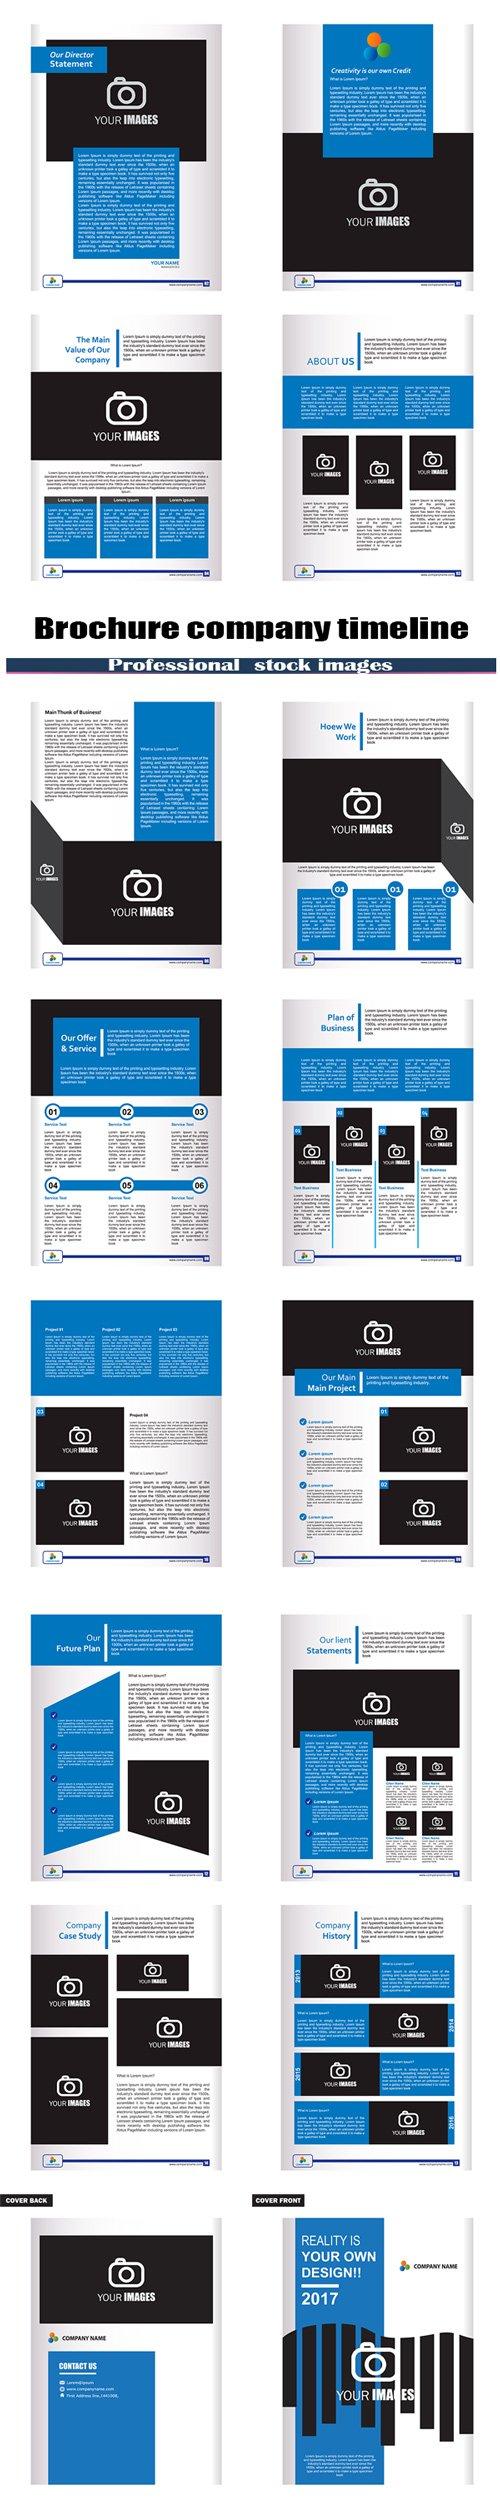 Brochure company timeline